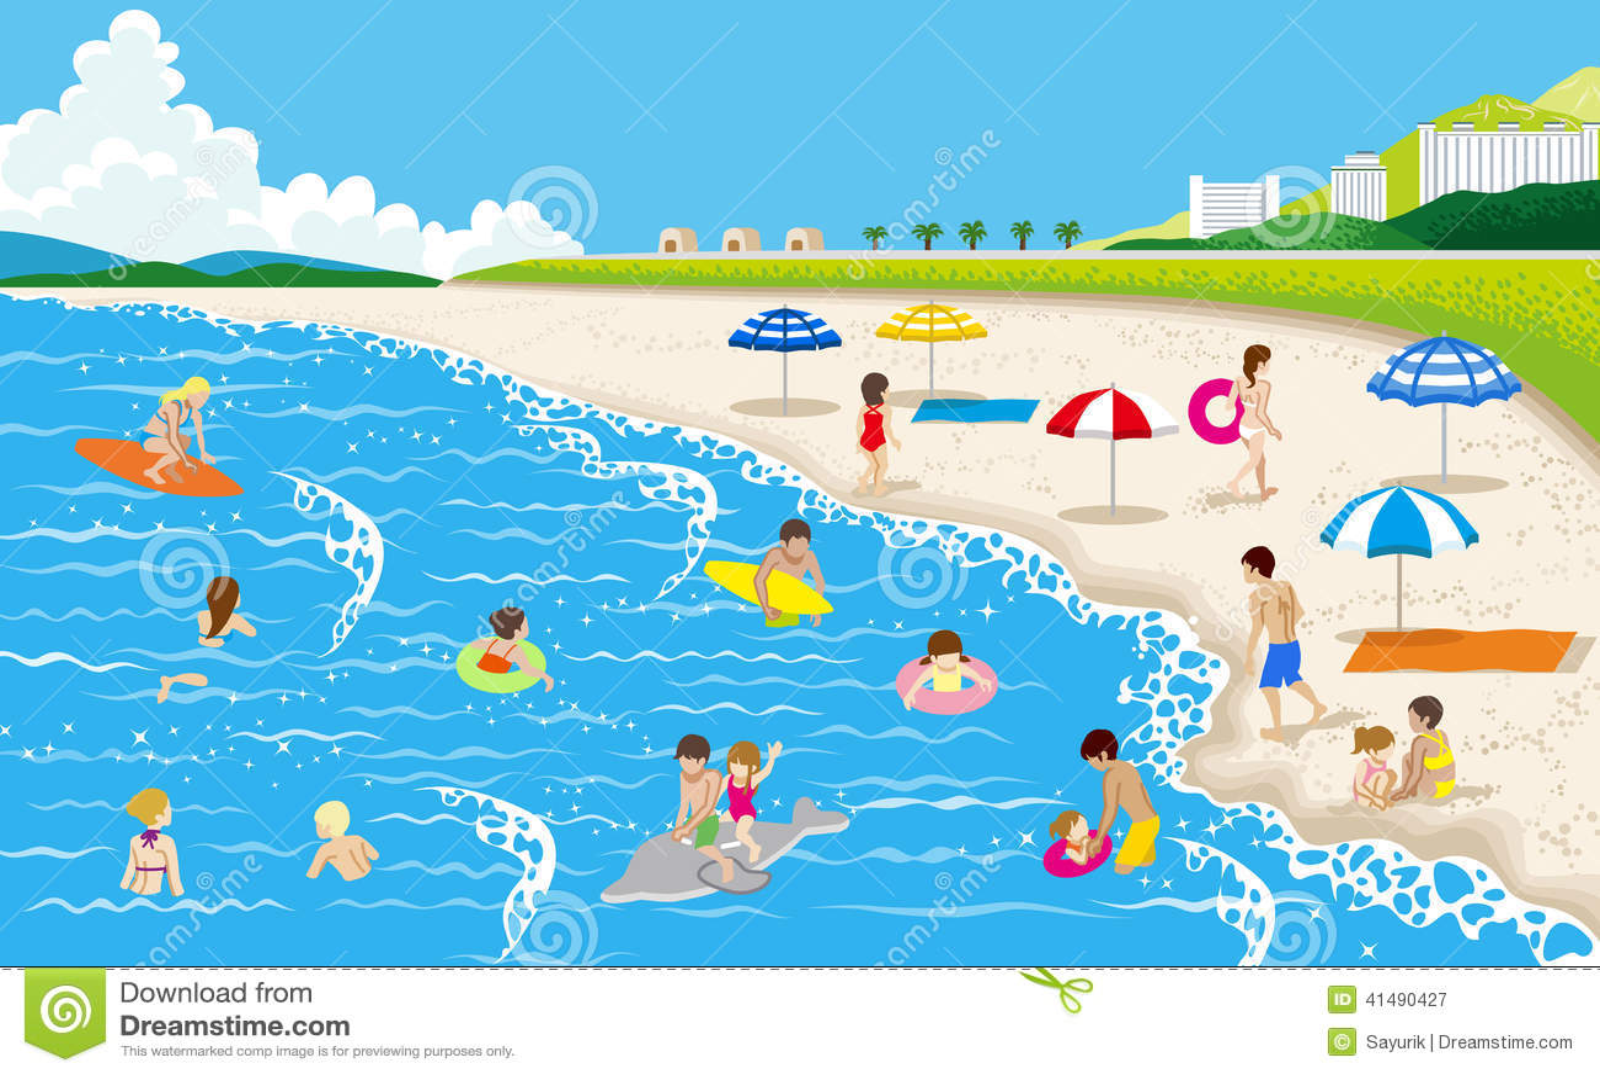 sea bed beach vector - photo #30